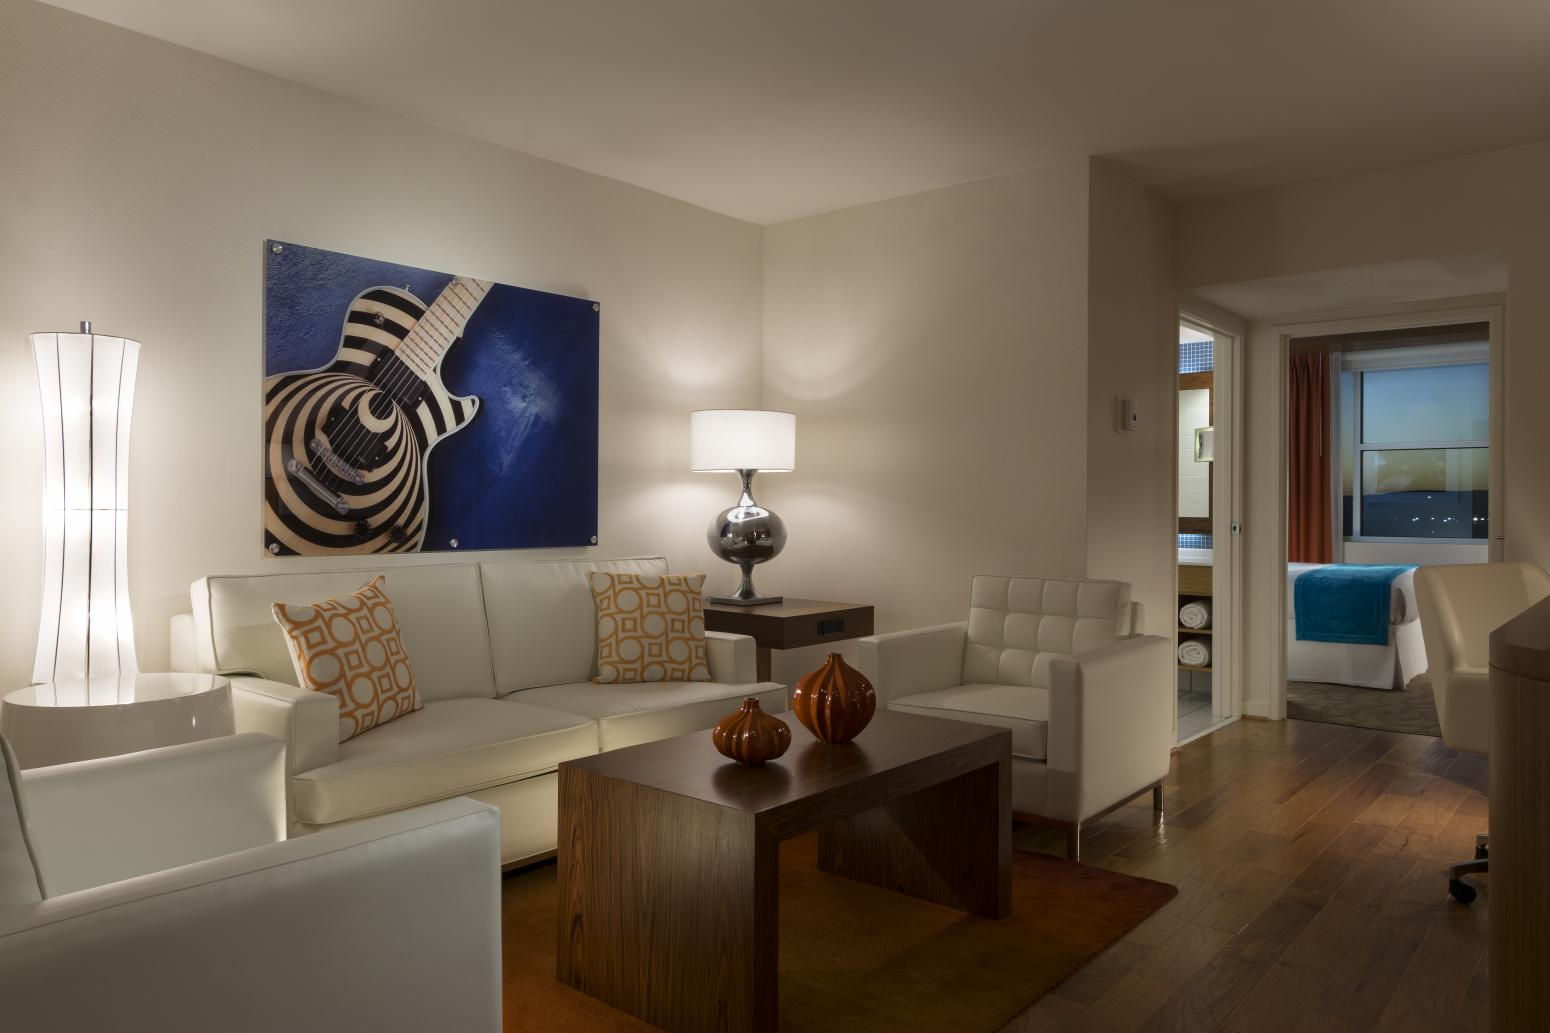 dallas hospitality design · hotel interior design dallas & Hospitality Interior Design | Hotel Interior Design | AKA Design Inc.